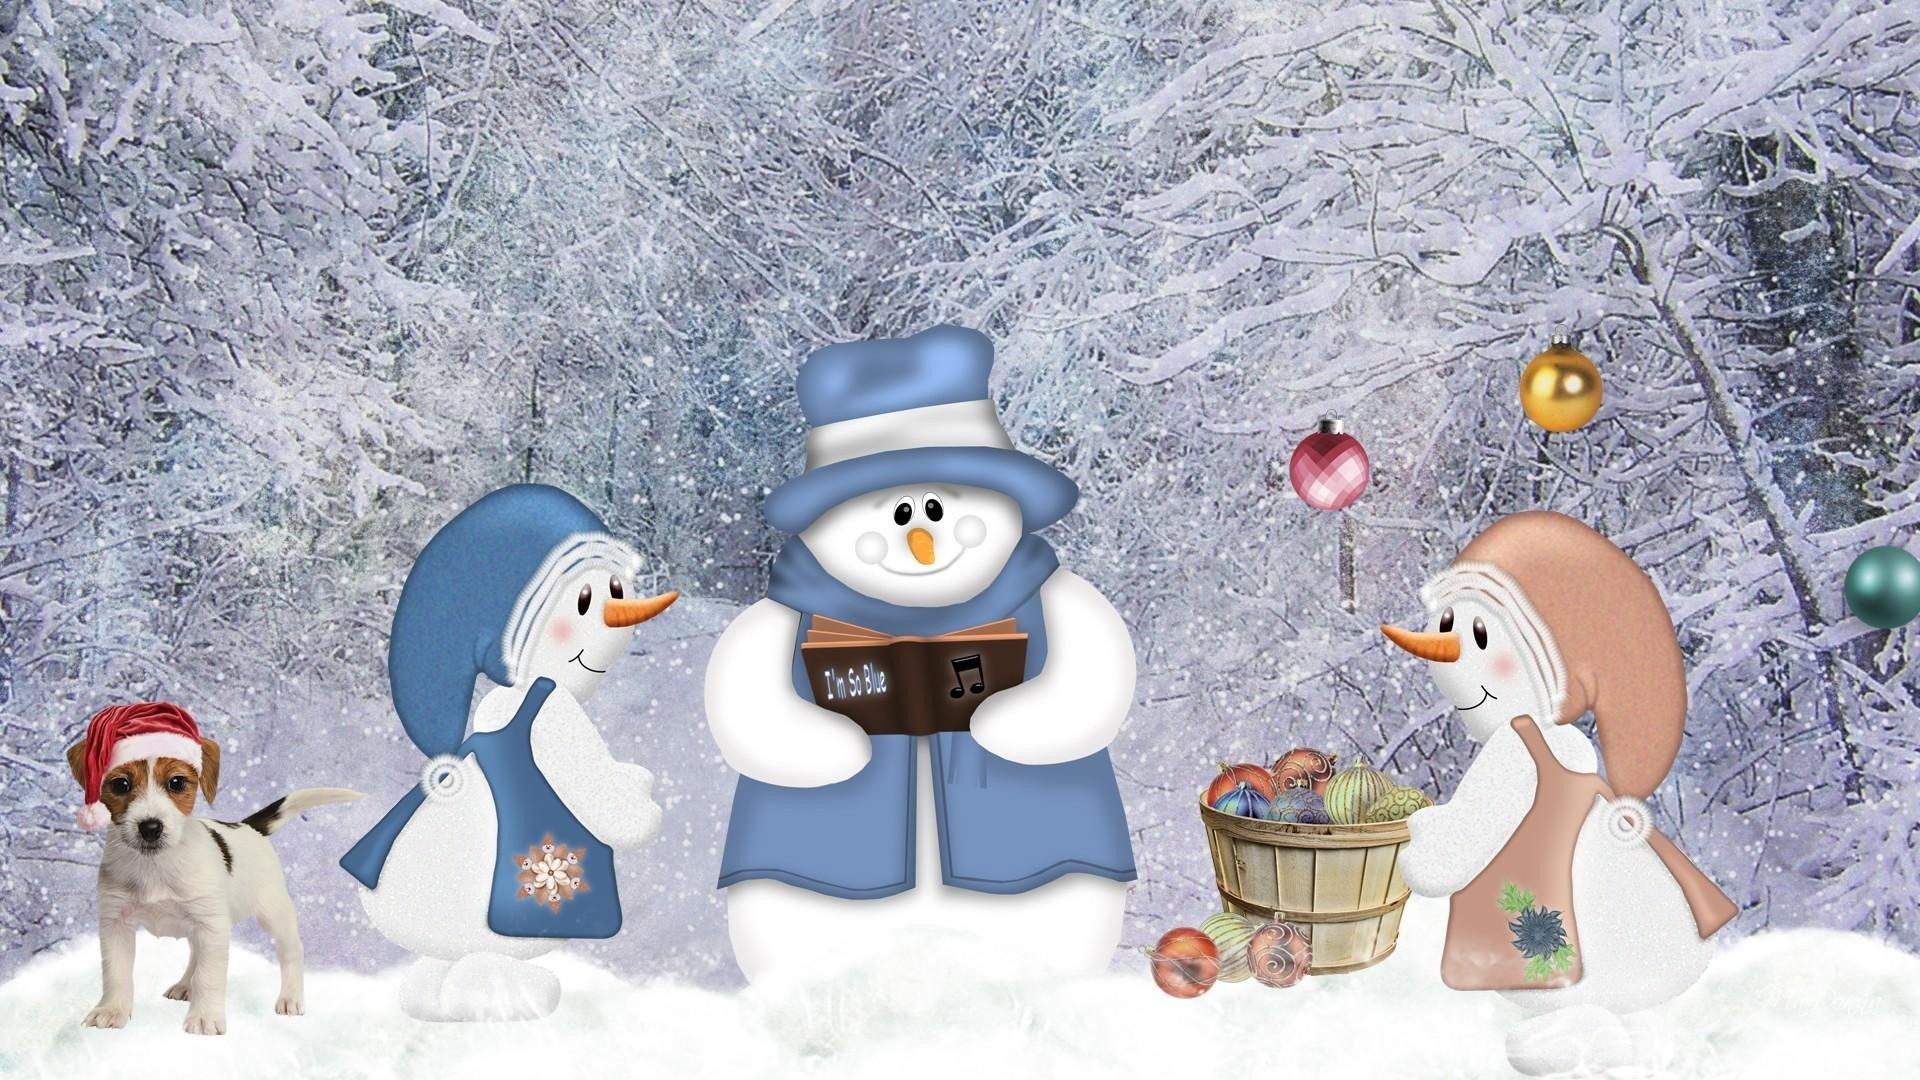 Country Snowman Desktop Wallpaper 41 images 1920x1080